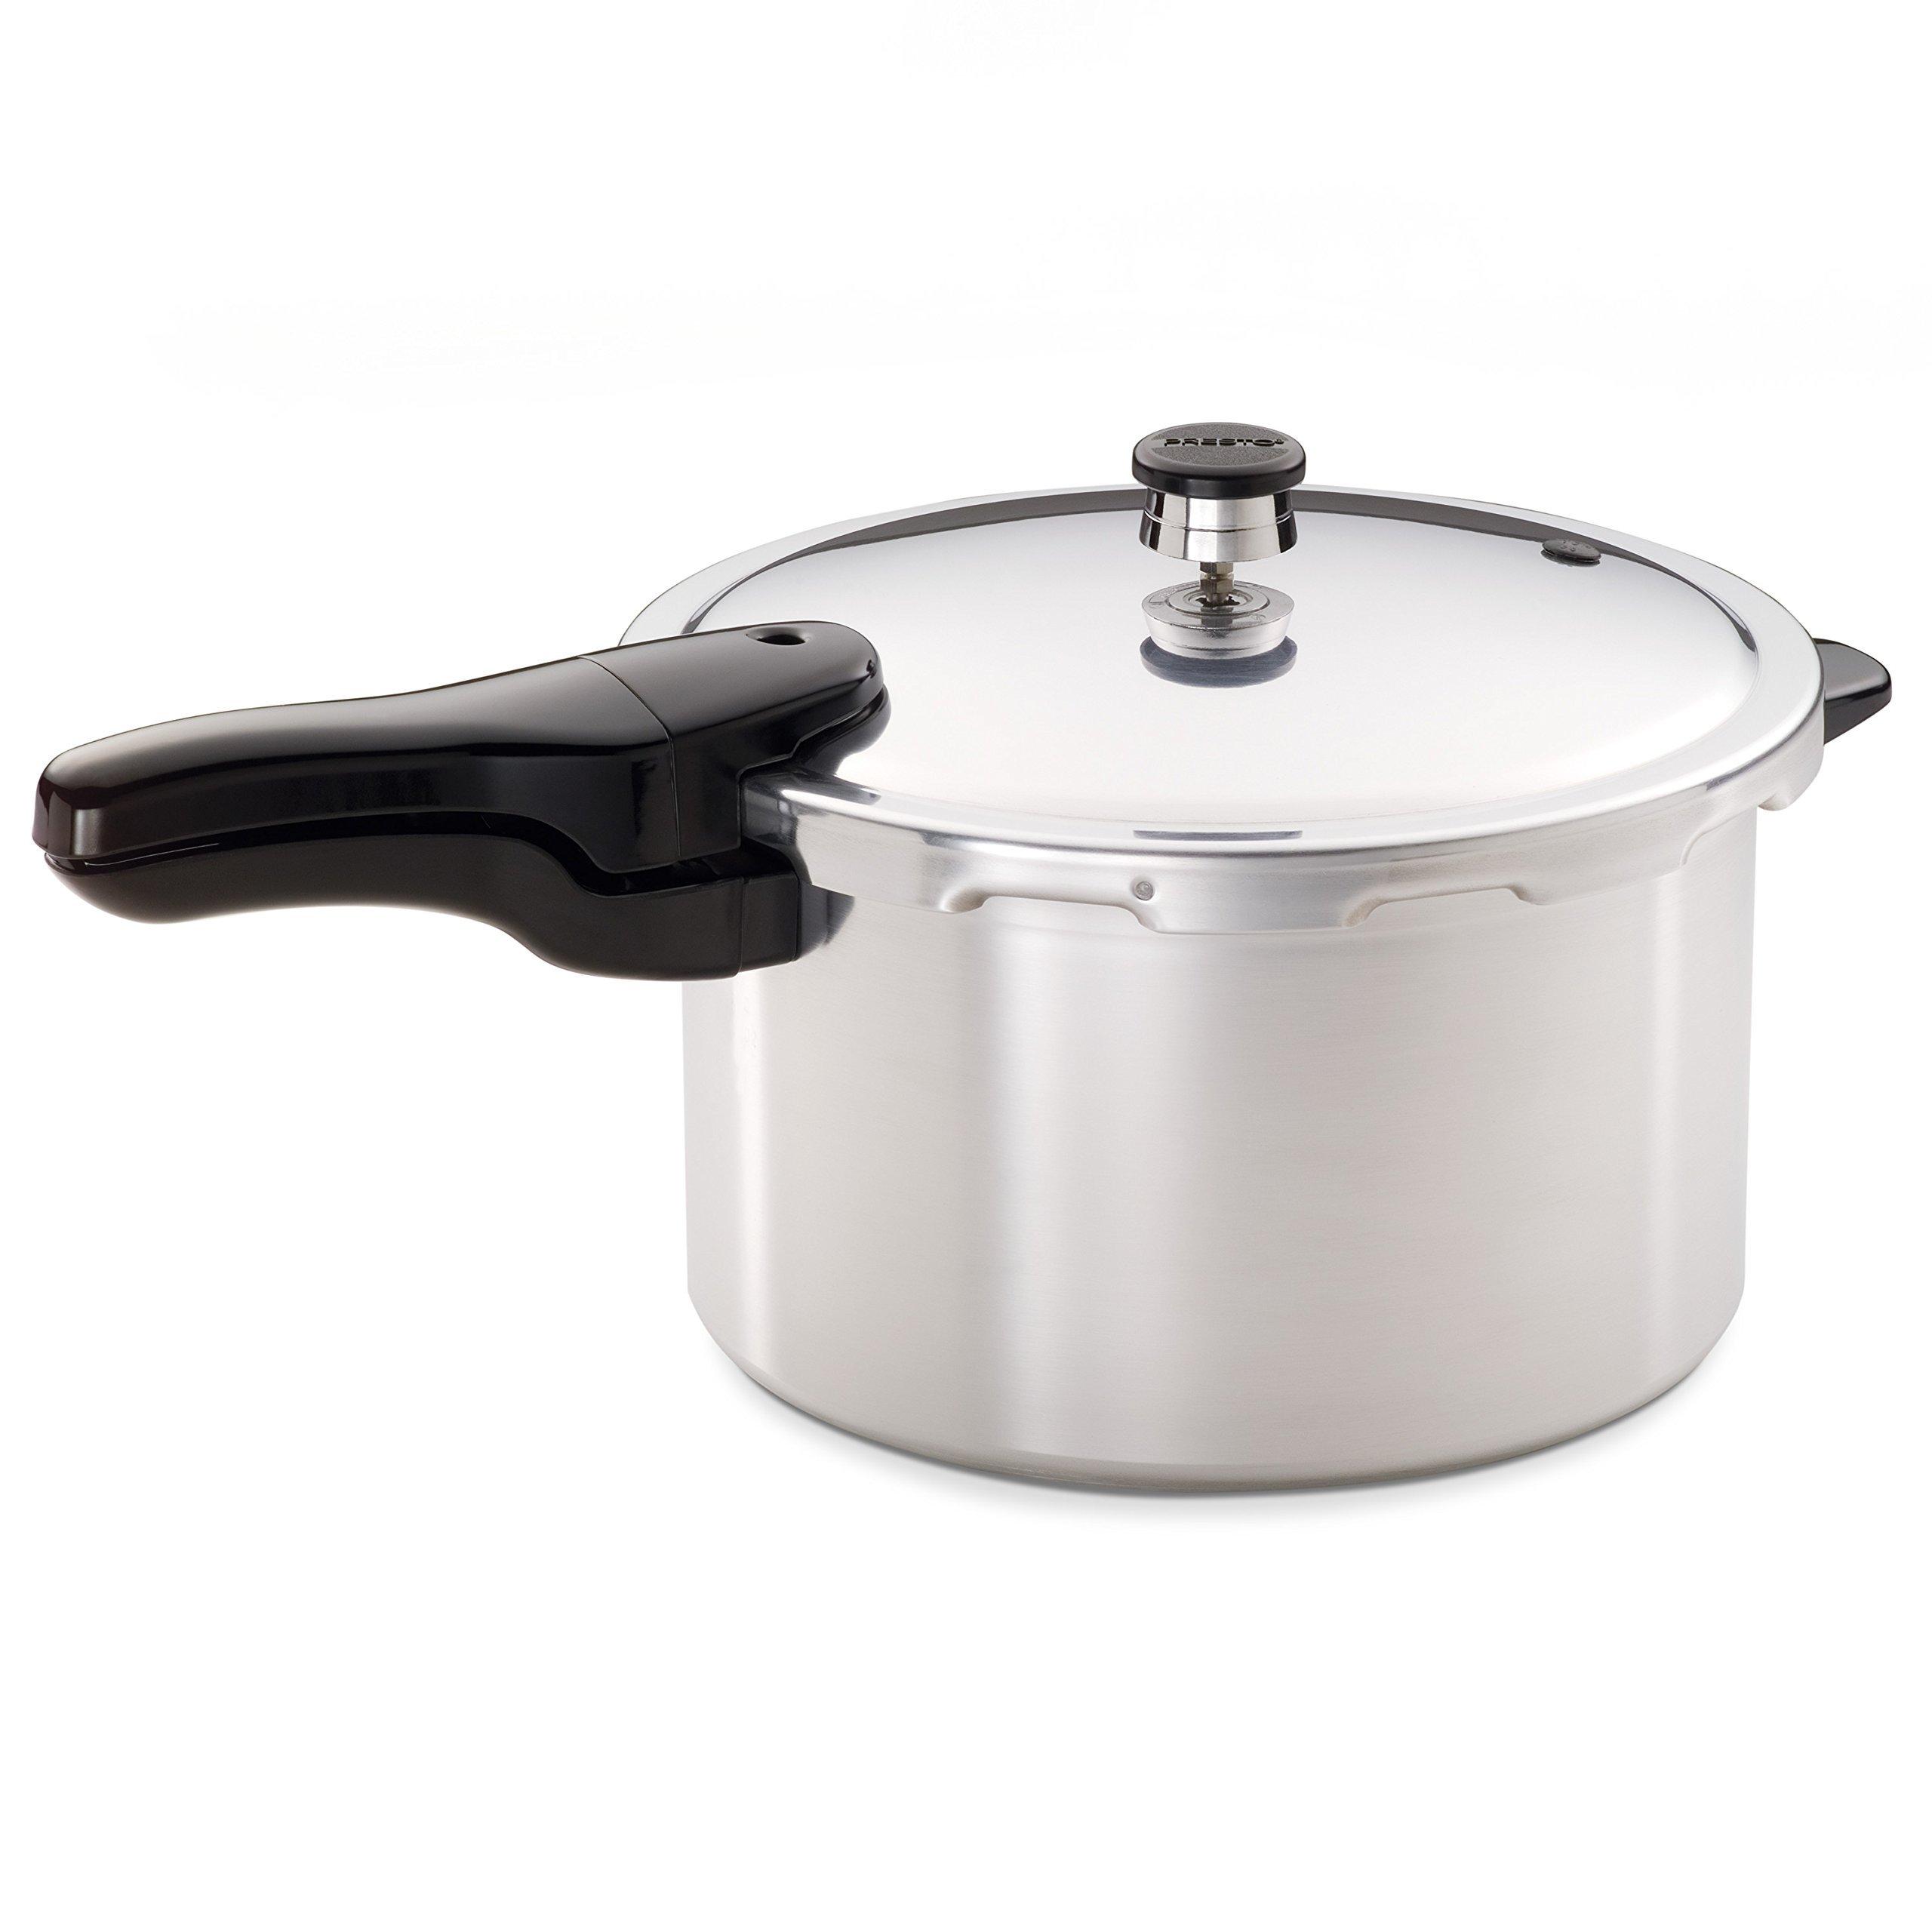 Presto 01282 8-Quart Aluminum Pressure Cooker (Renewed) by Presto